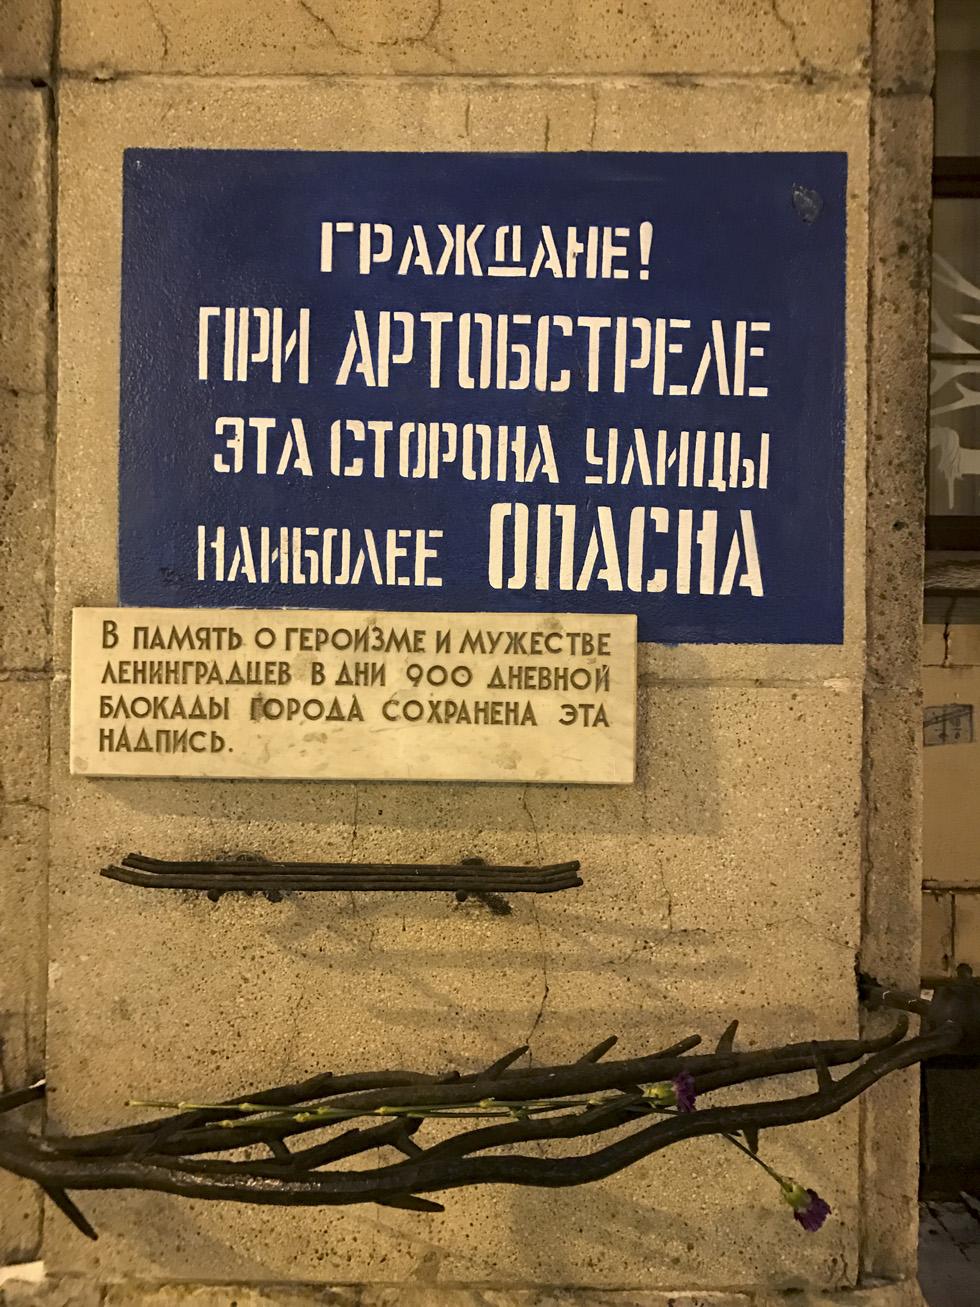 Фото: Дмитрий Мирский